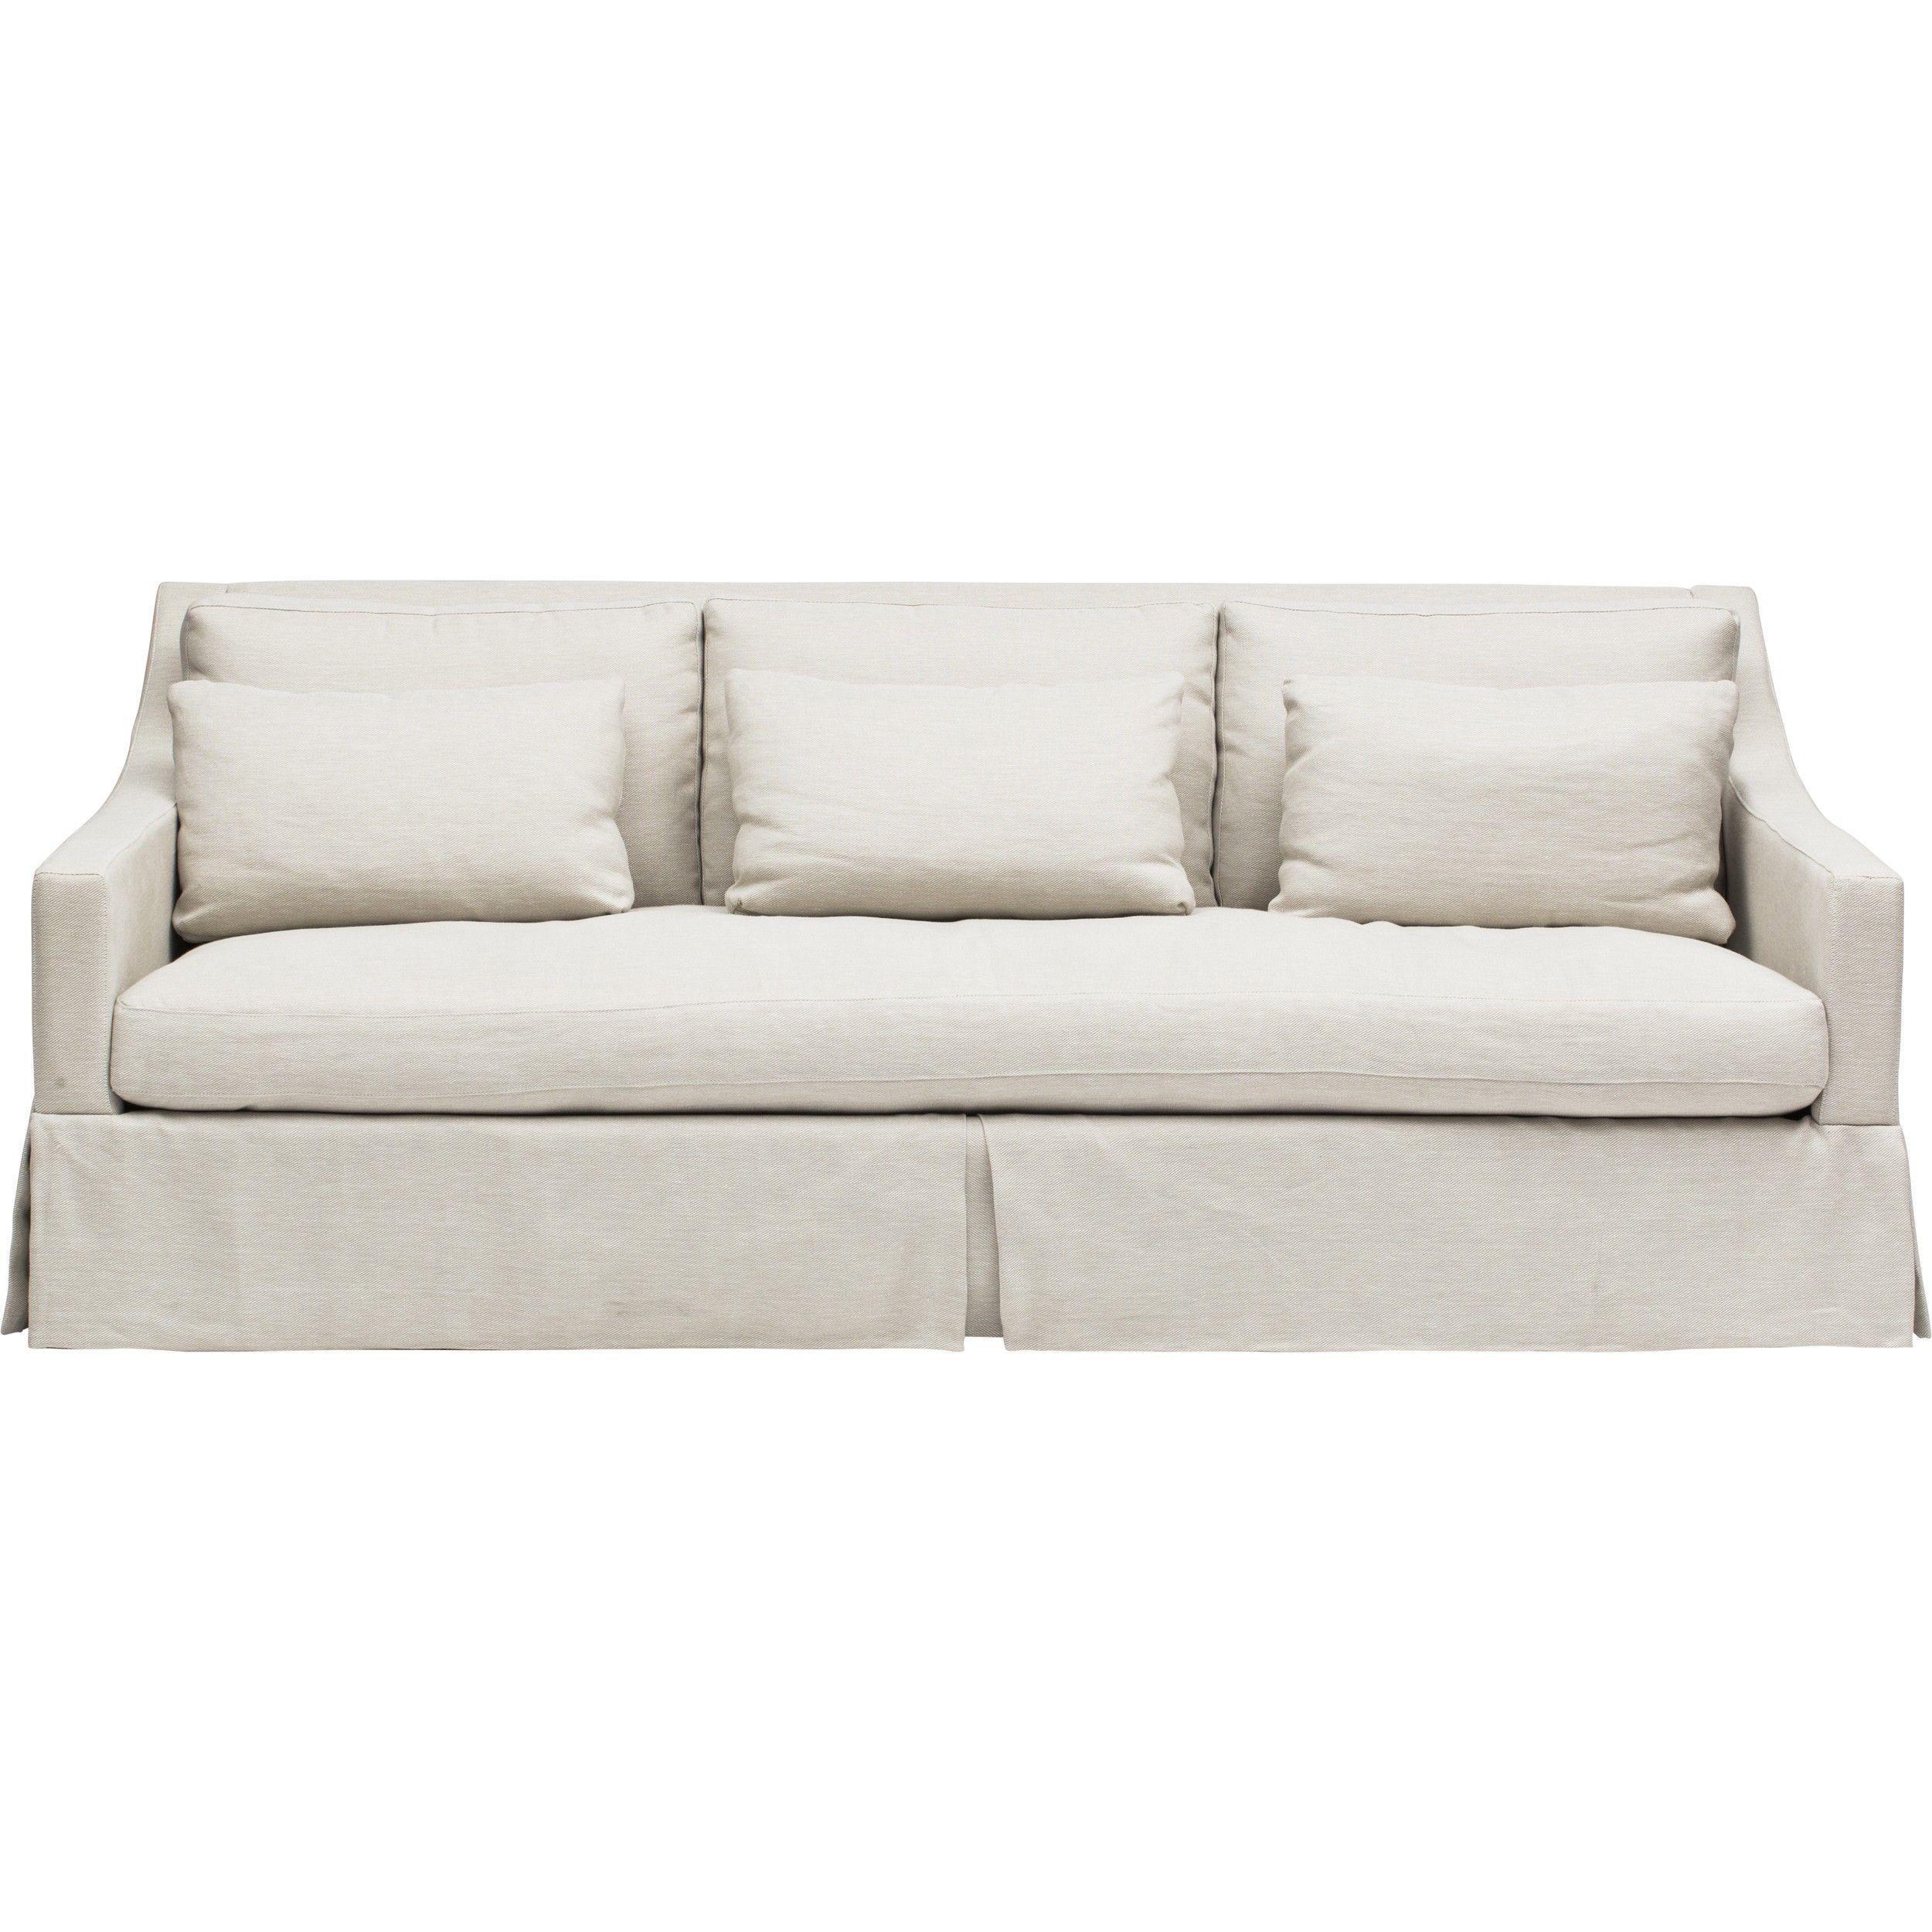 Brilliant Albion Sofa Sofas In 2019 Leather Living Room Furniture Home Interior And Landscaping Eliaenasavecom